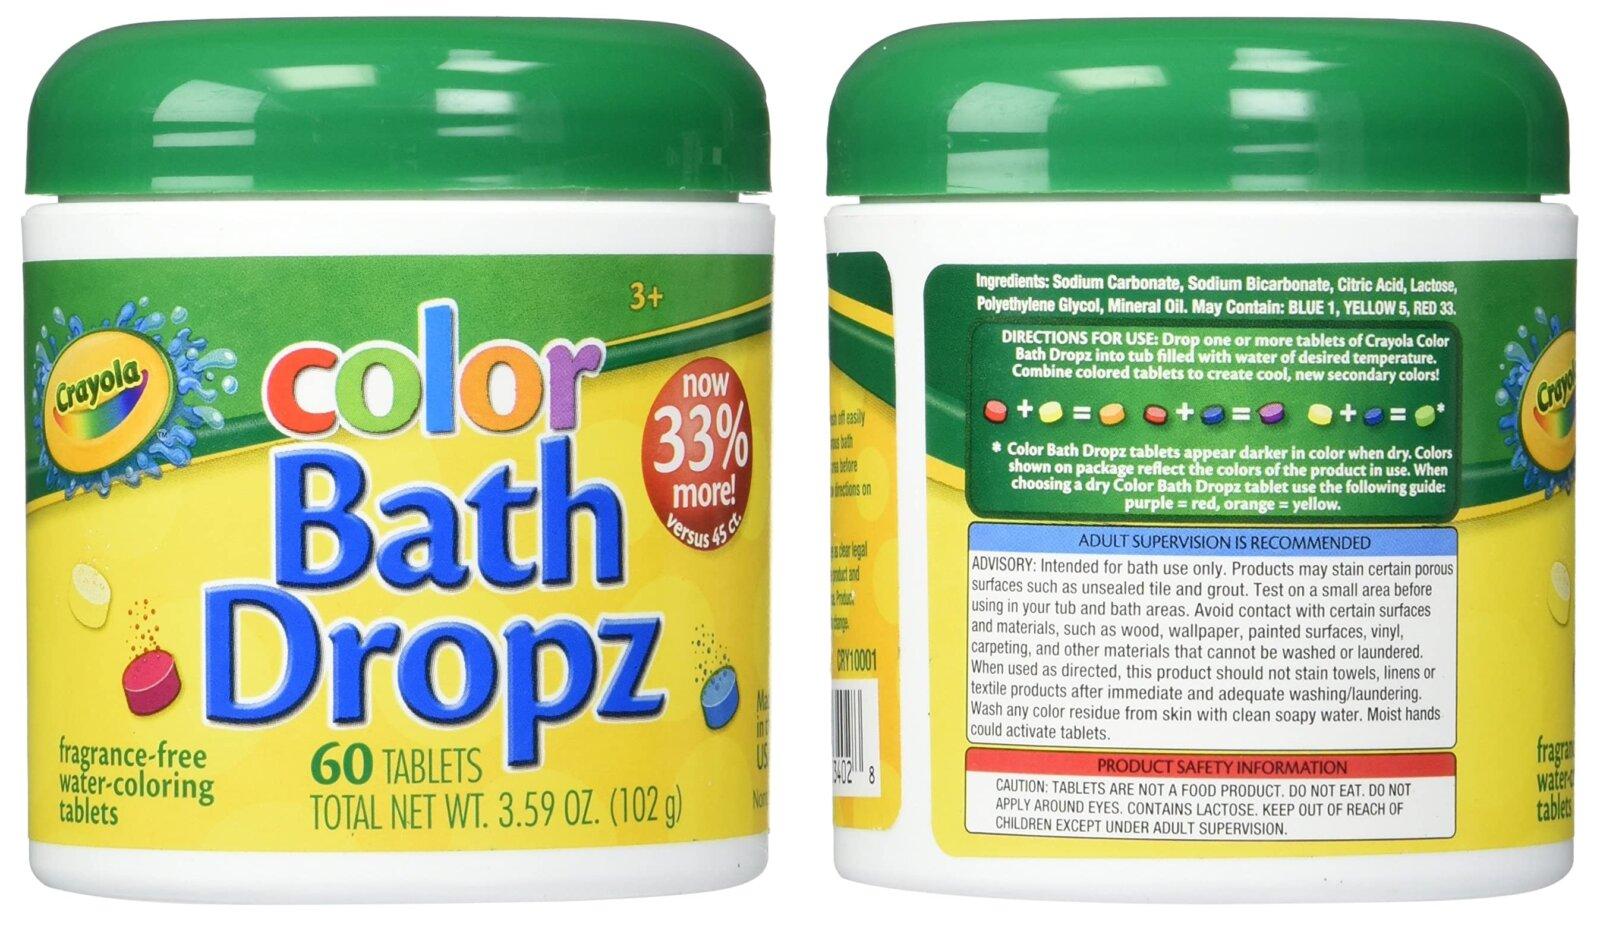 These Crayola colour 'bath dropz' help make bath time fun for kids, The Manc